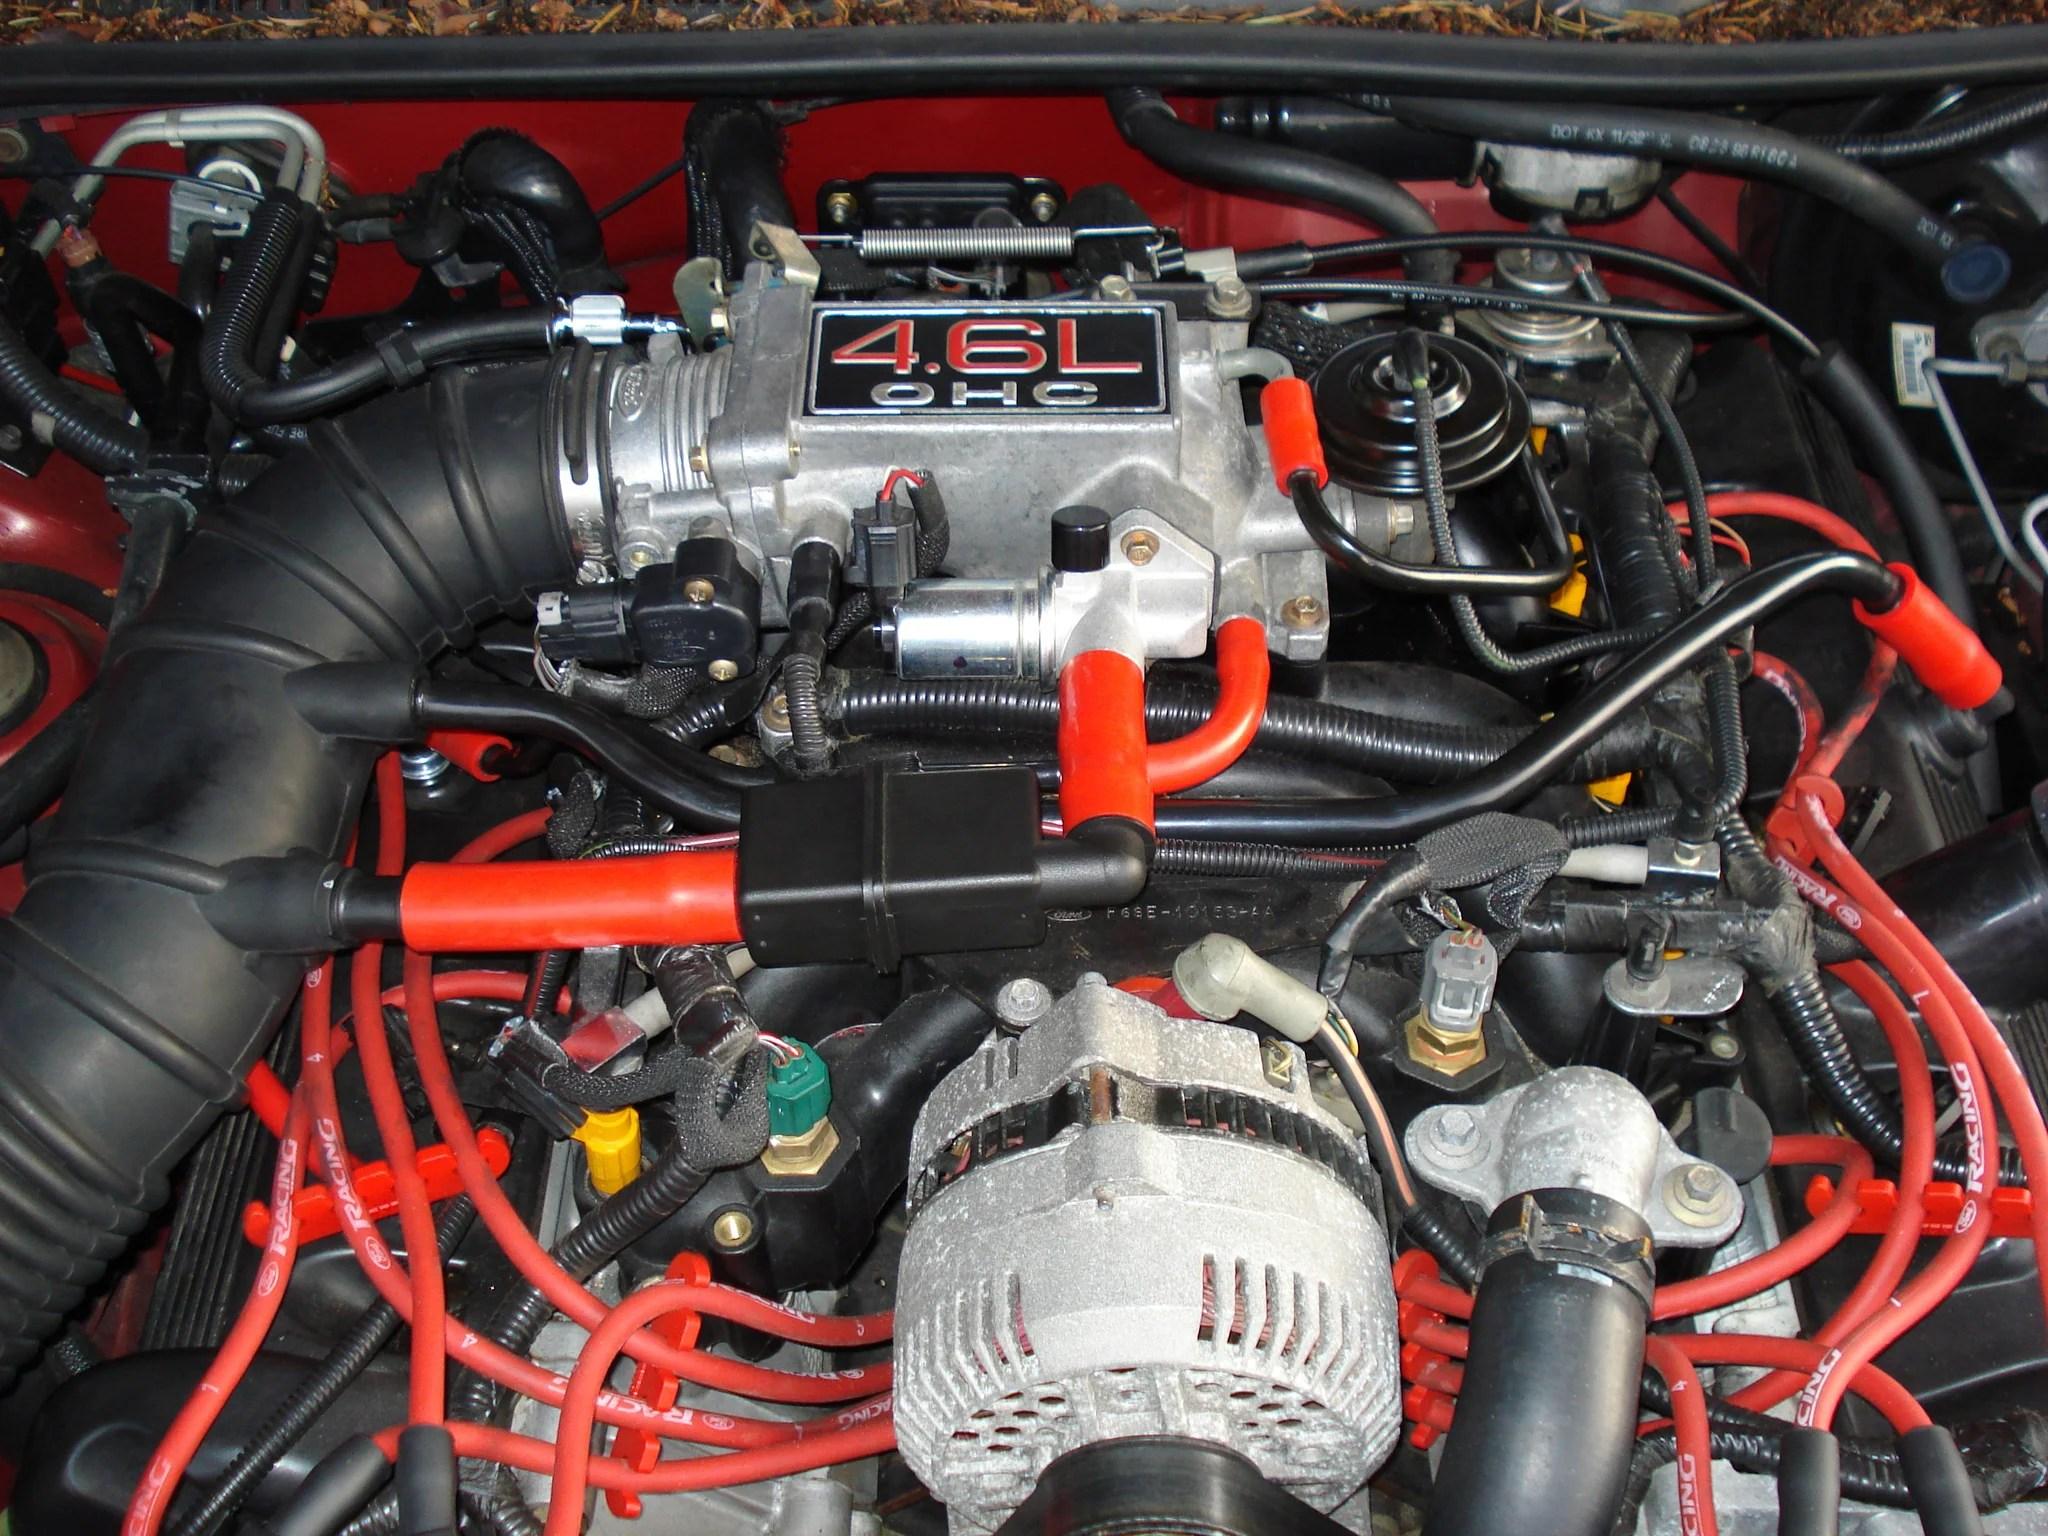 hpsi silicone vacuum hose kit ford thunderbird v8 4 6 liter 1994 1997  [ 2048 x 1536 Pixel ]